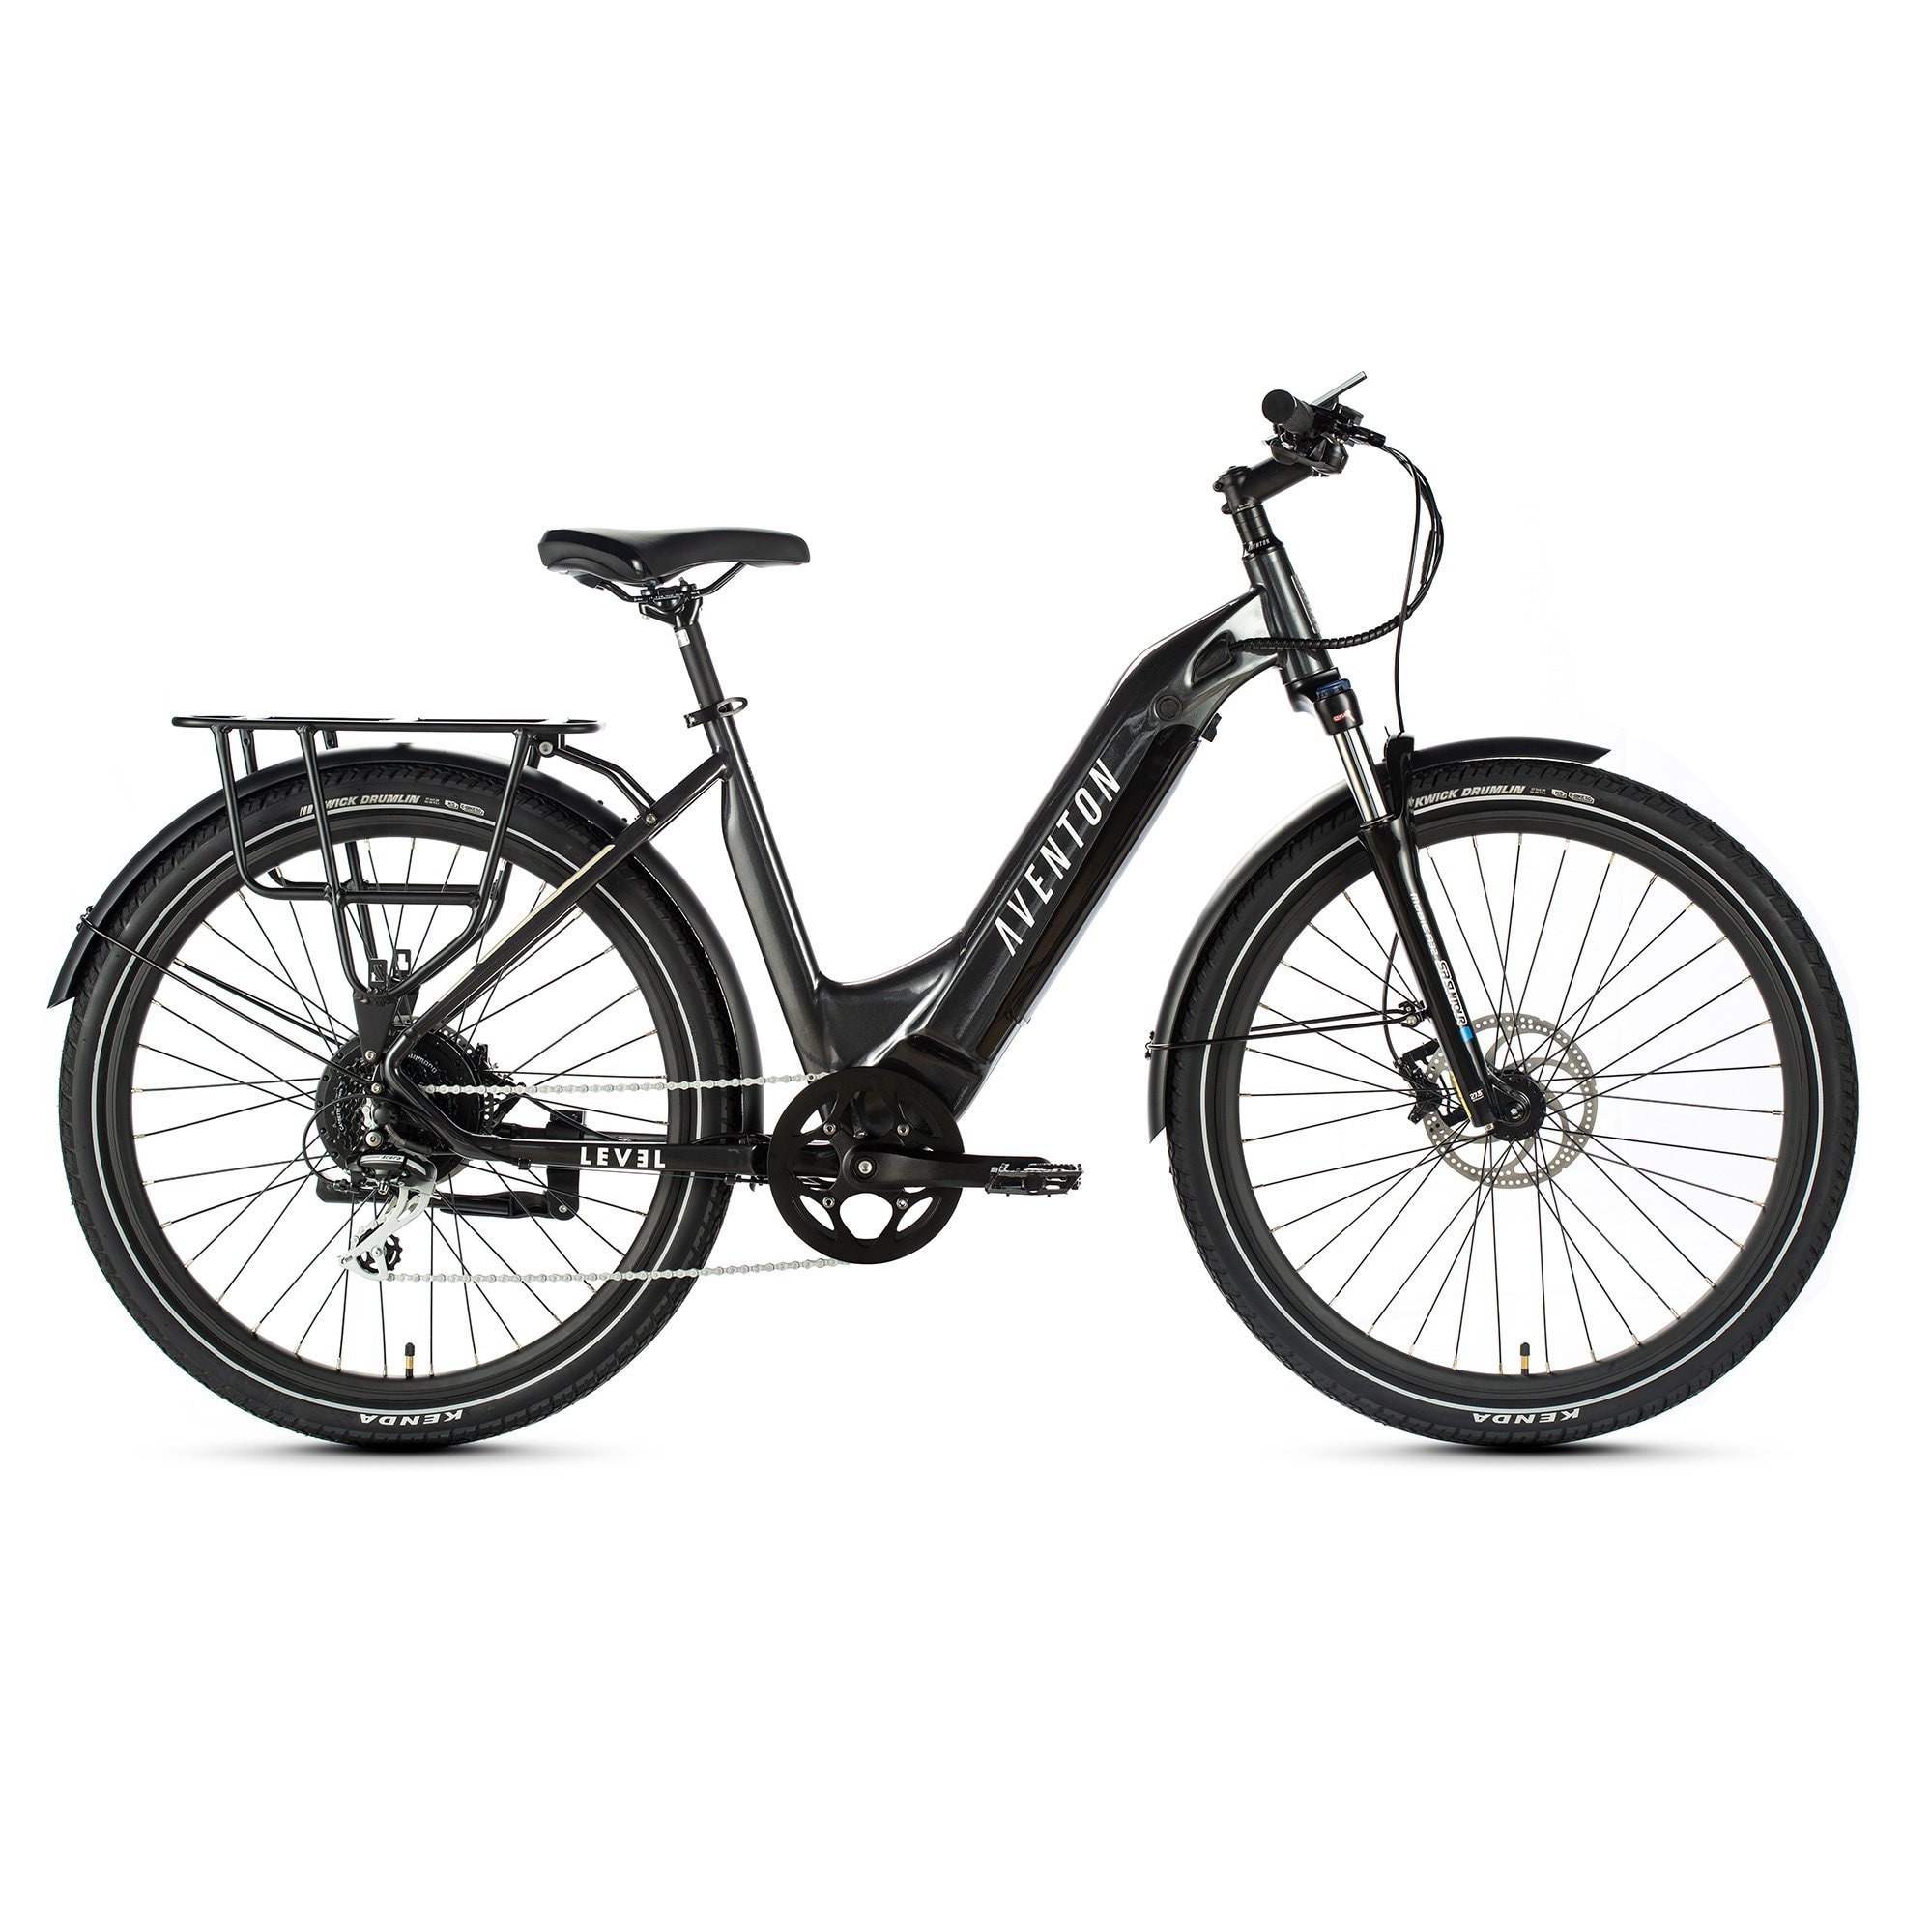 Level Step-Through Commuter eBike from Aventon Bikes